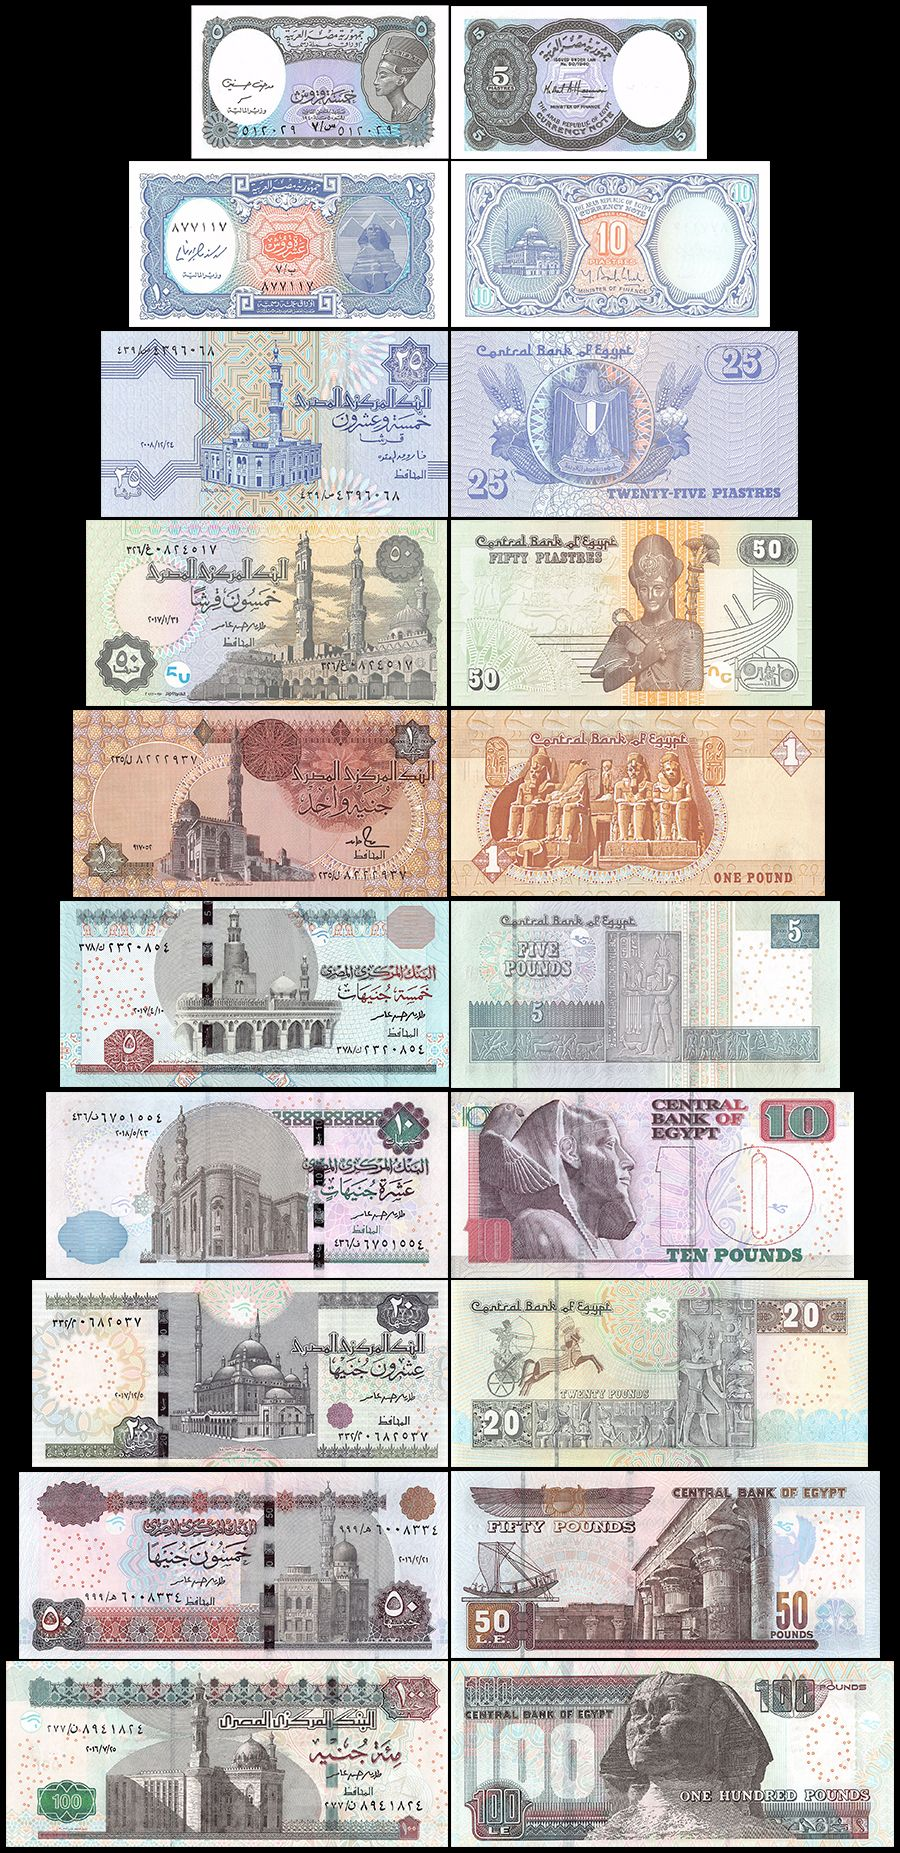 Egypt UNC Note 1 Pound 2007 P-50